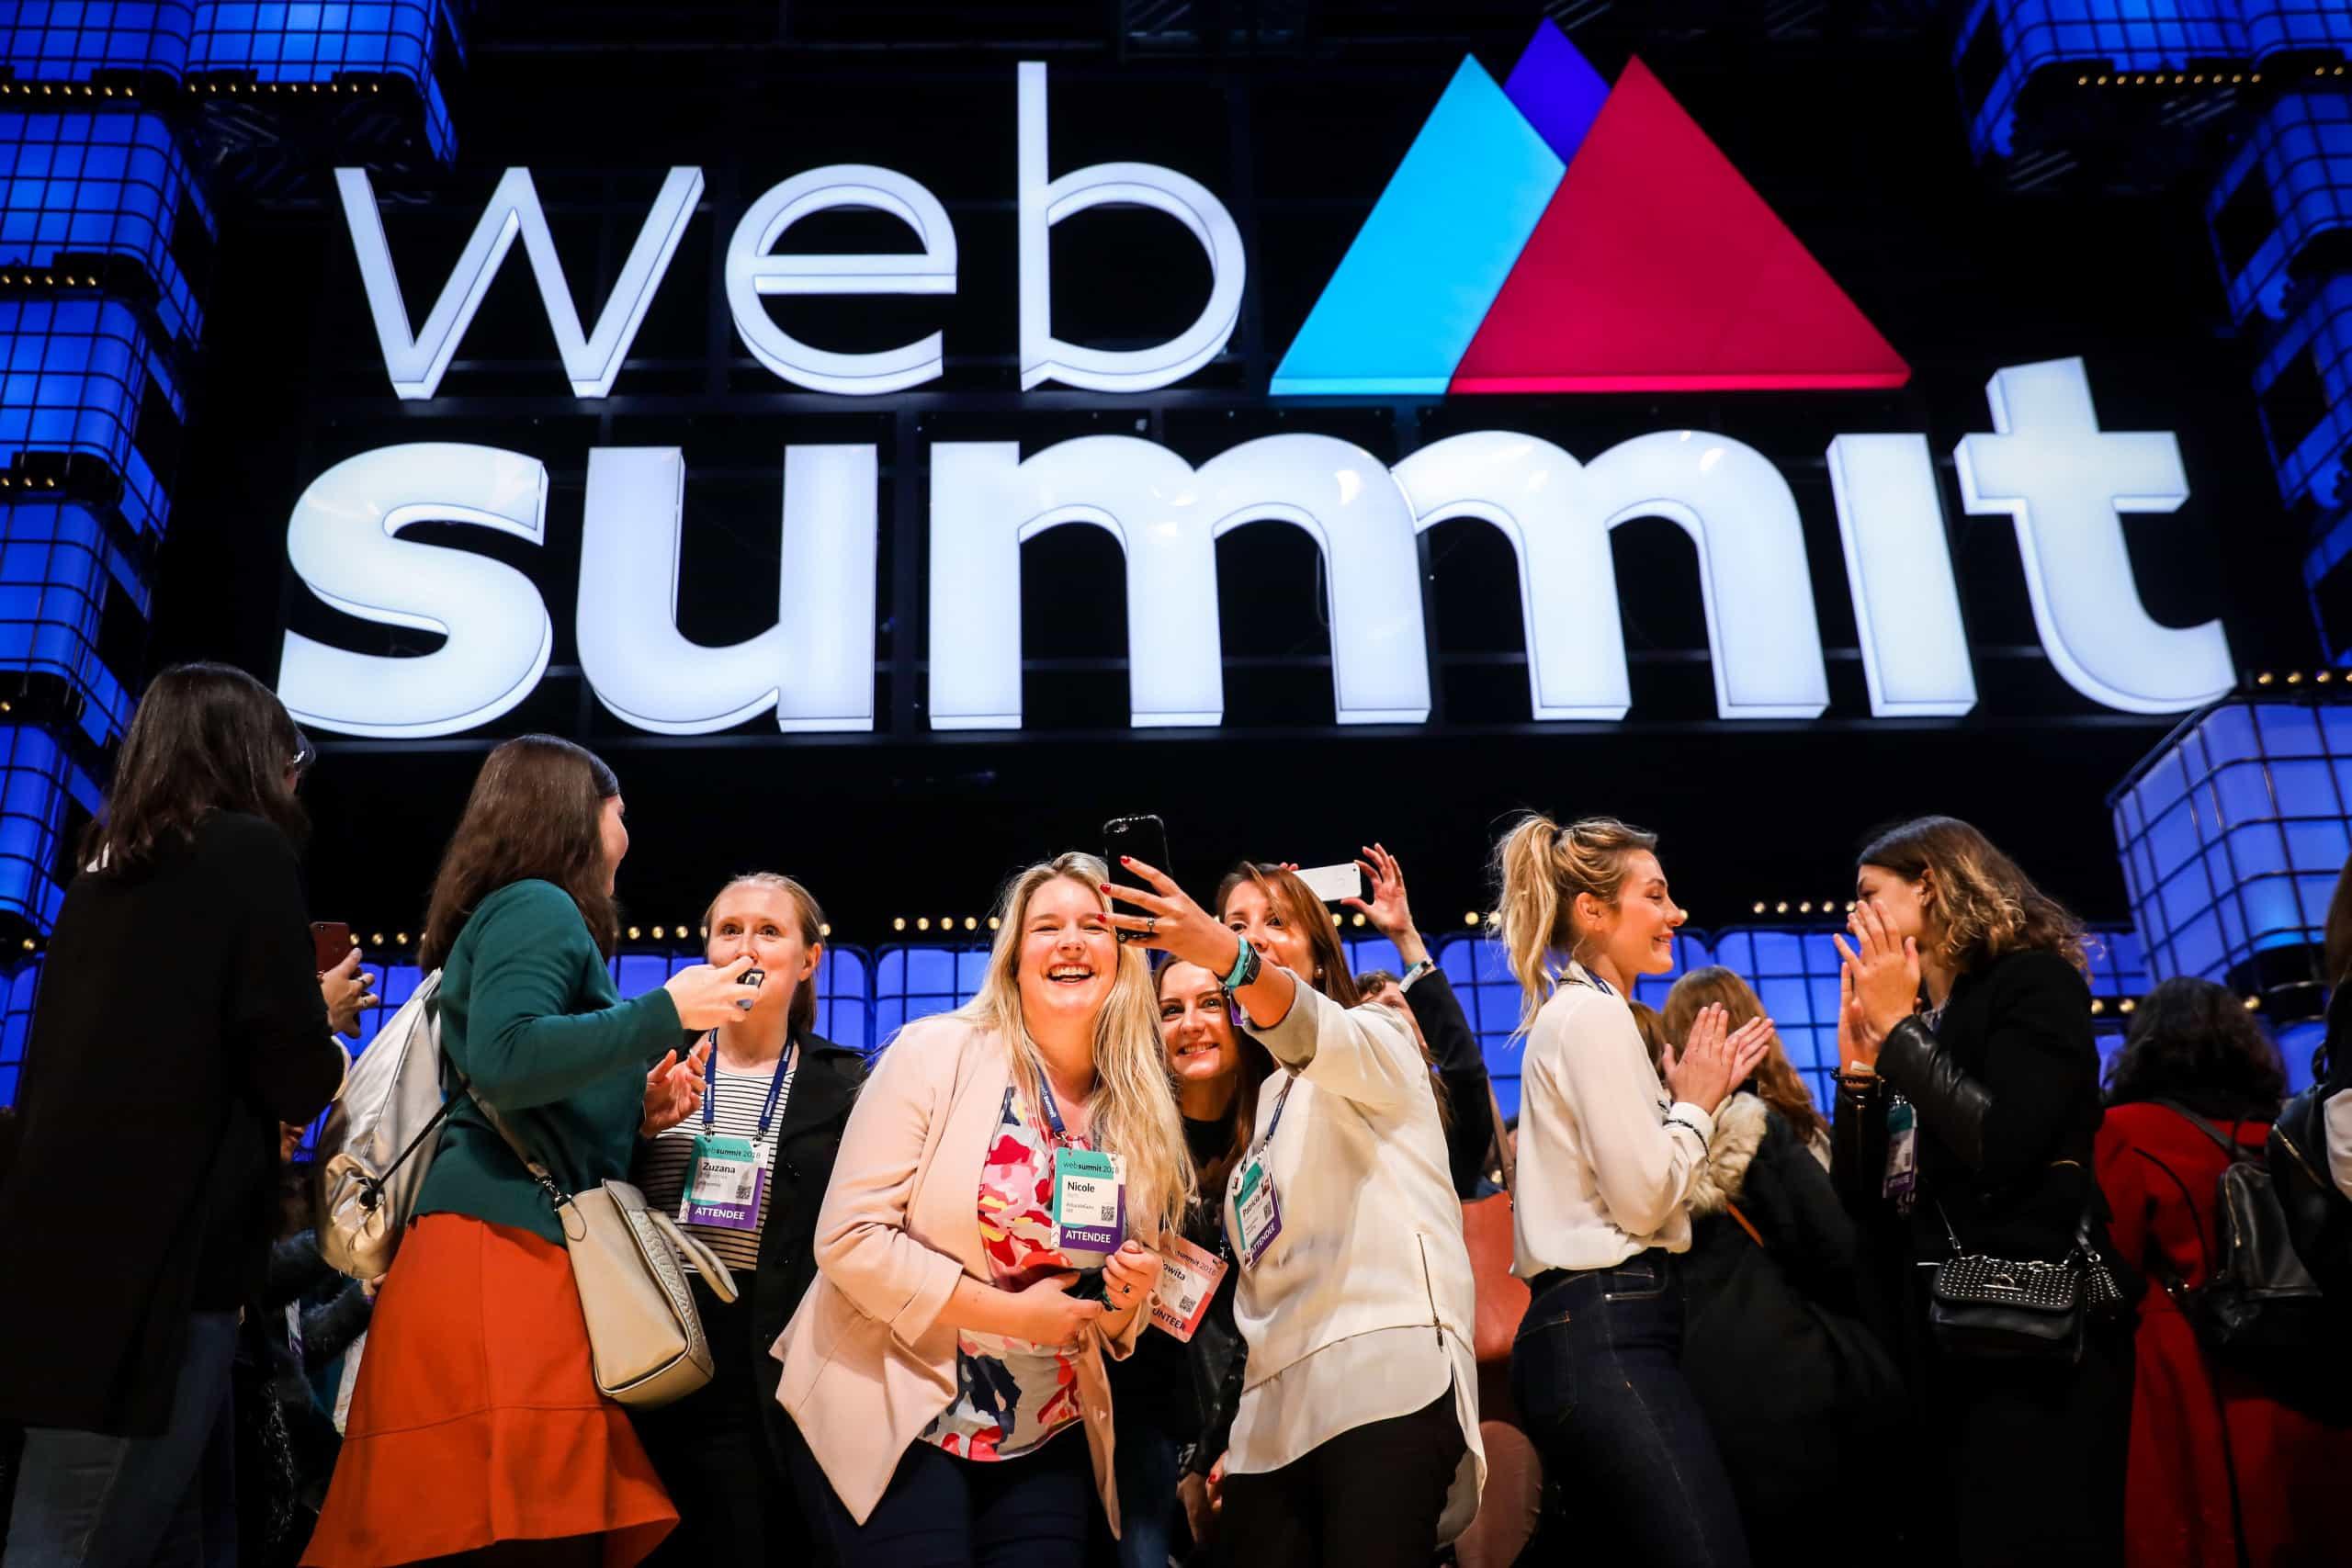 Compras 'tax free' crescem 13% em Lisboa durante Web Summit